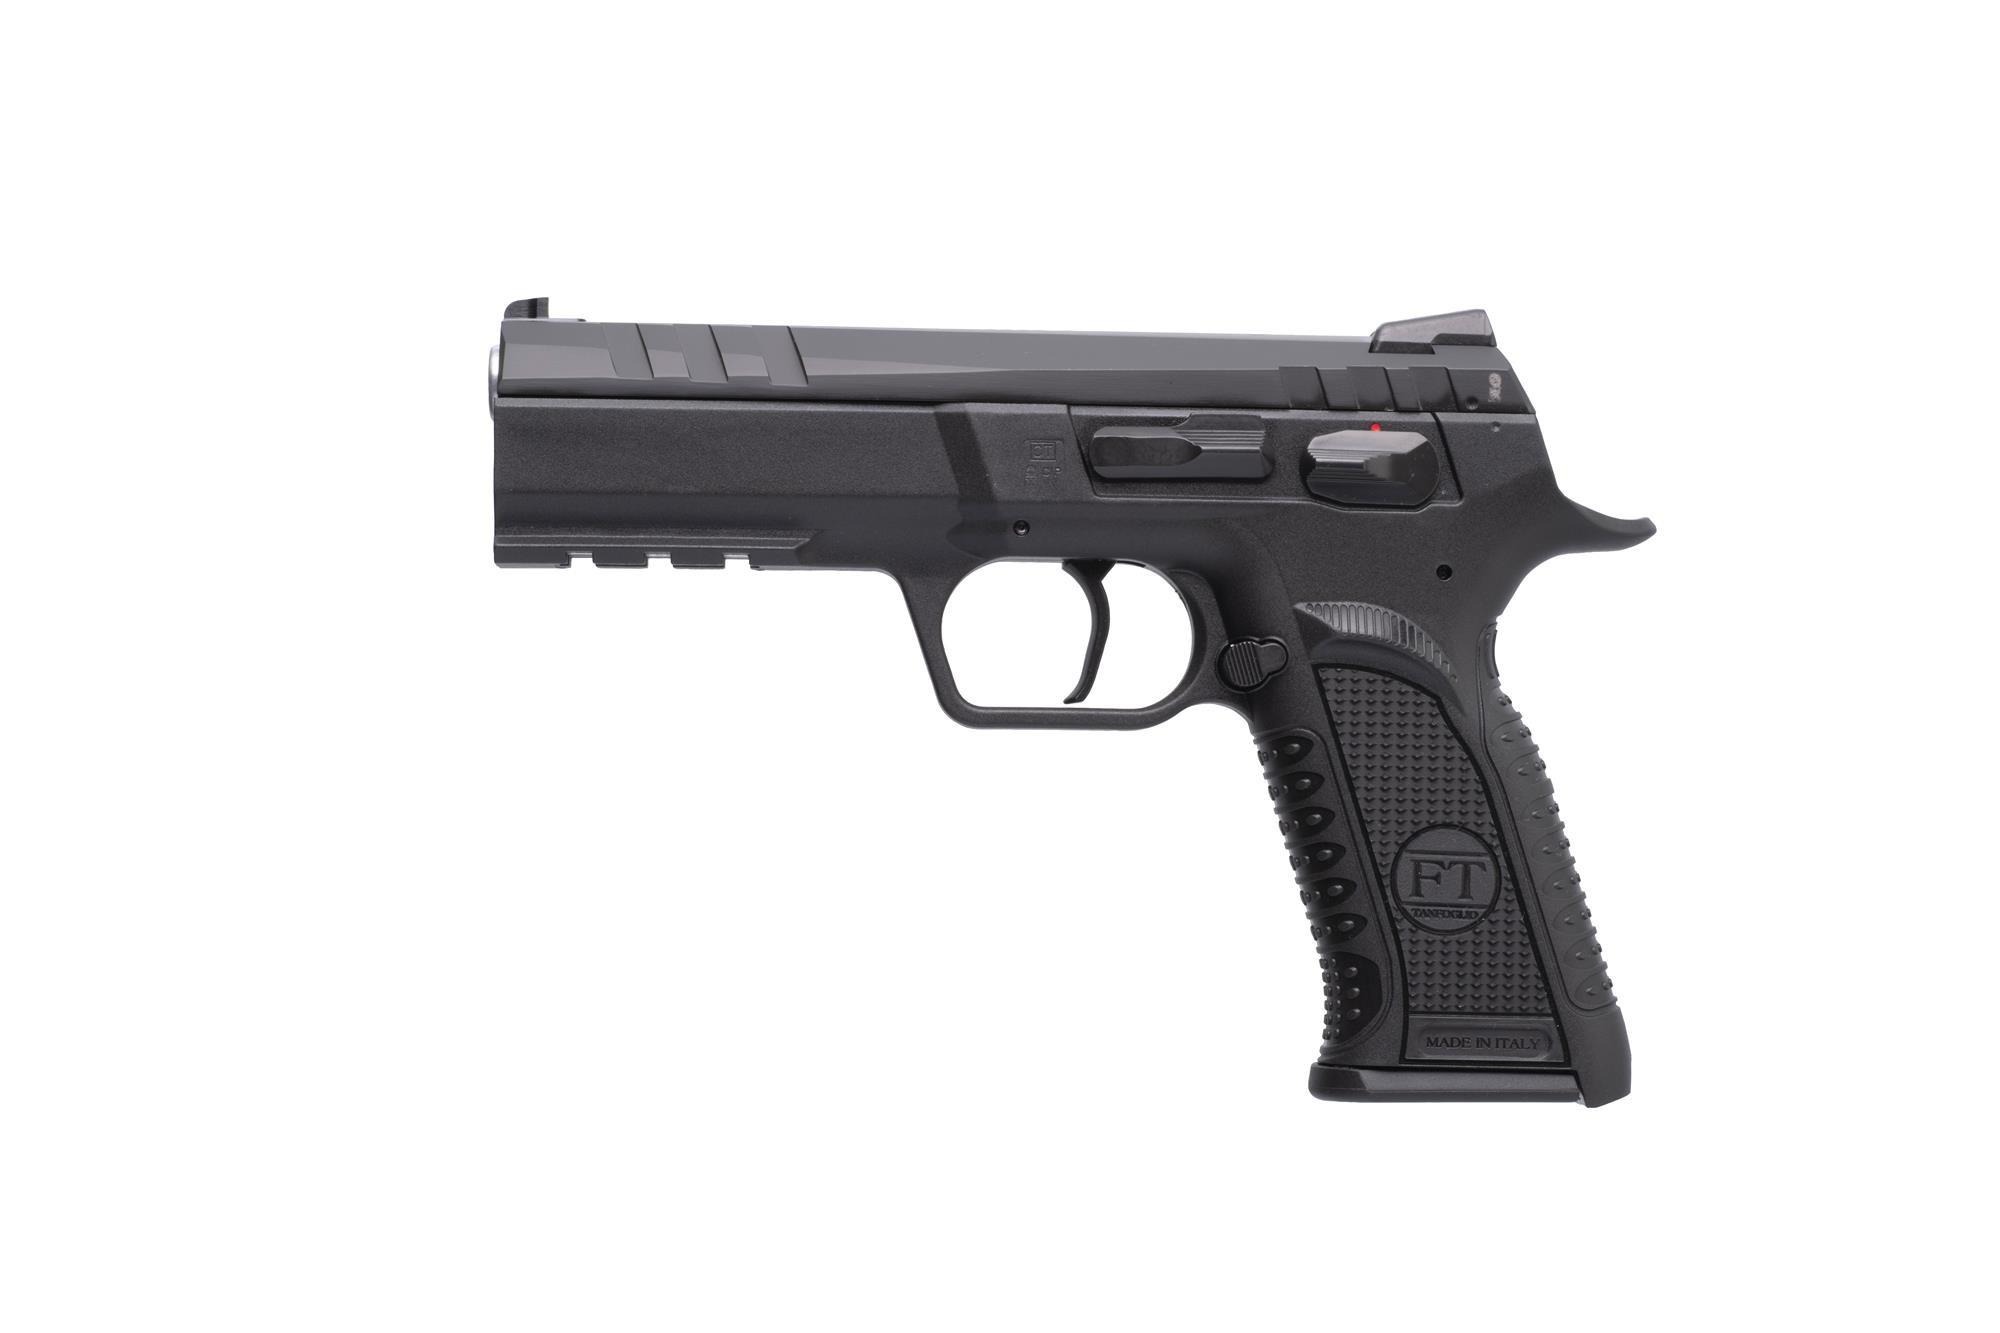 PRÉ-VENDA Pistola Tanfoglio Force Esse - Calibre 9mm